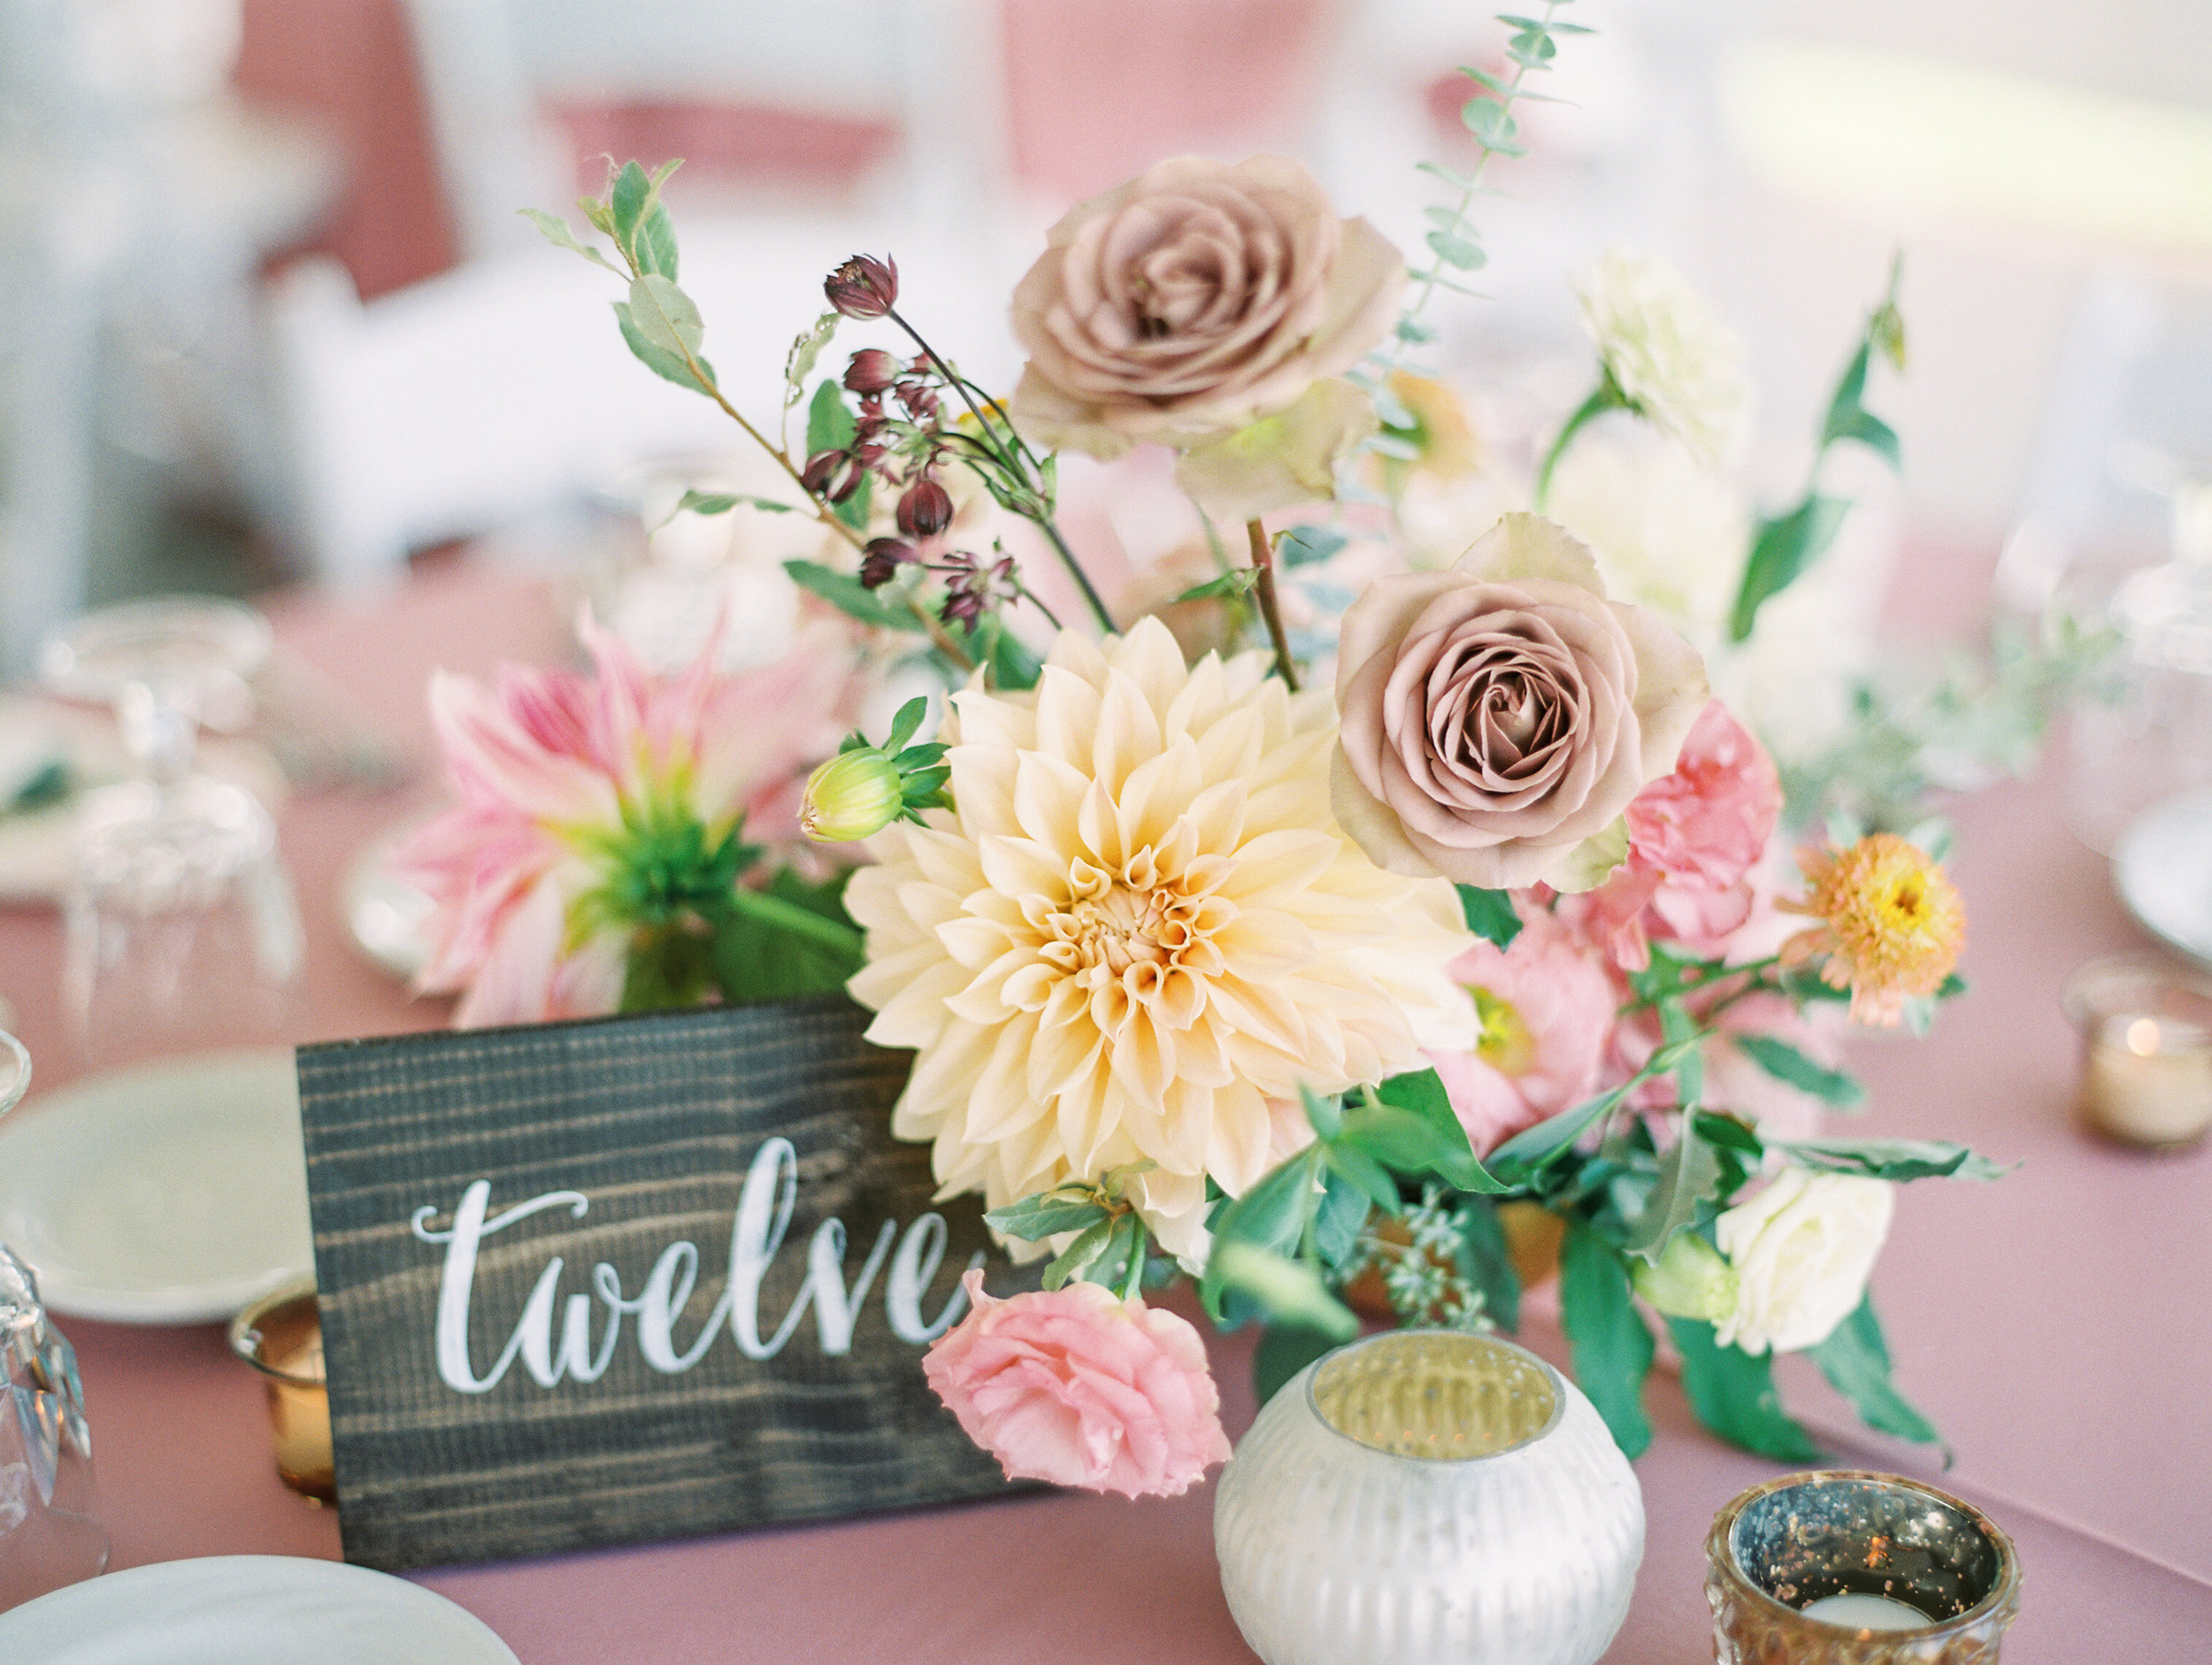 Zoller+Wedding+Reception+Detailsf-21.jpg